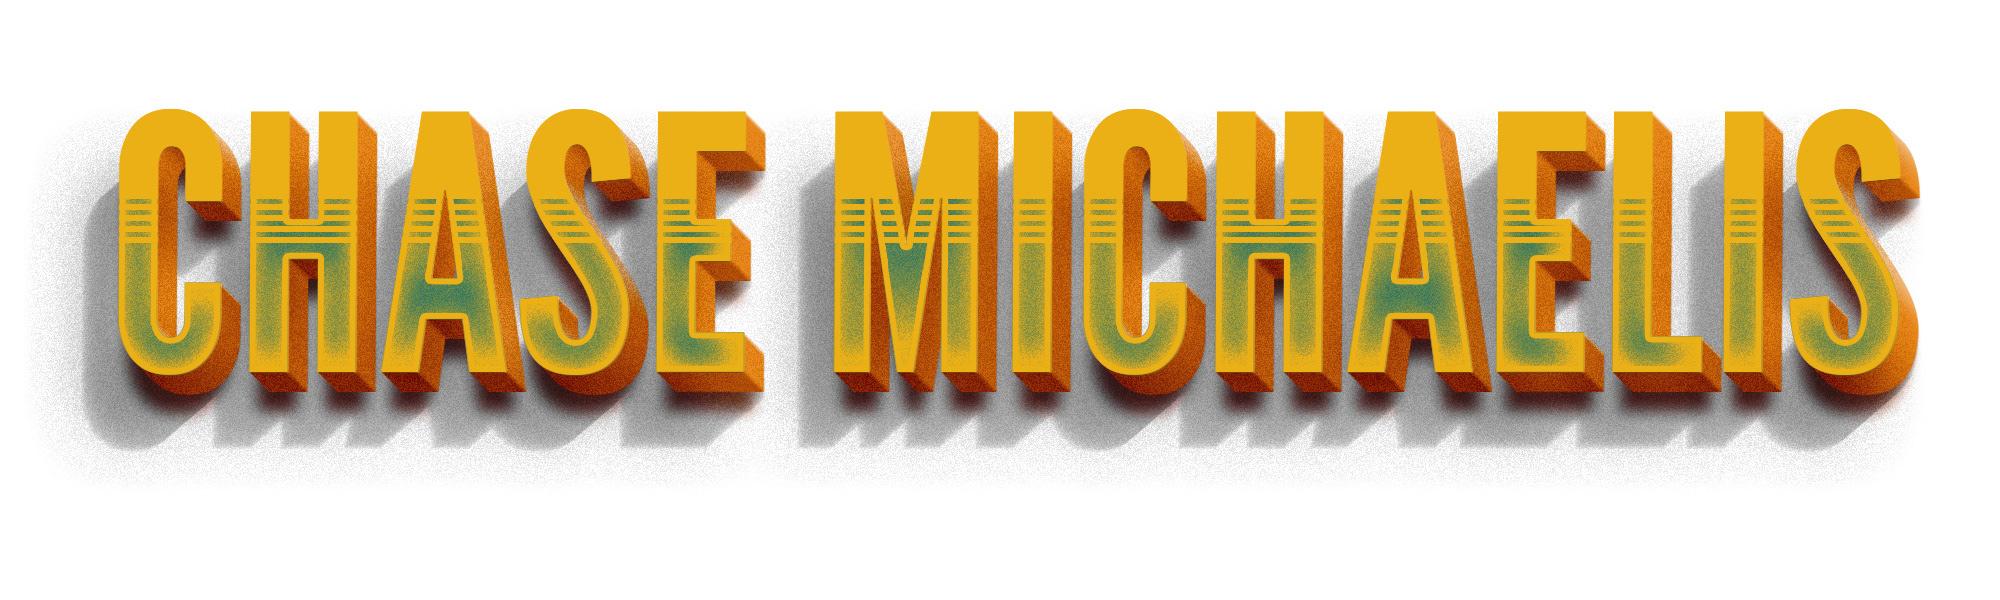 Chase Michaelis